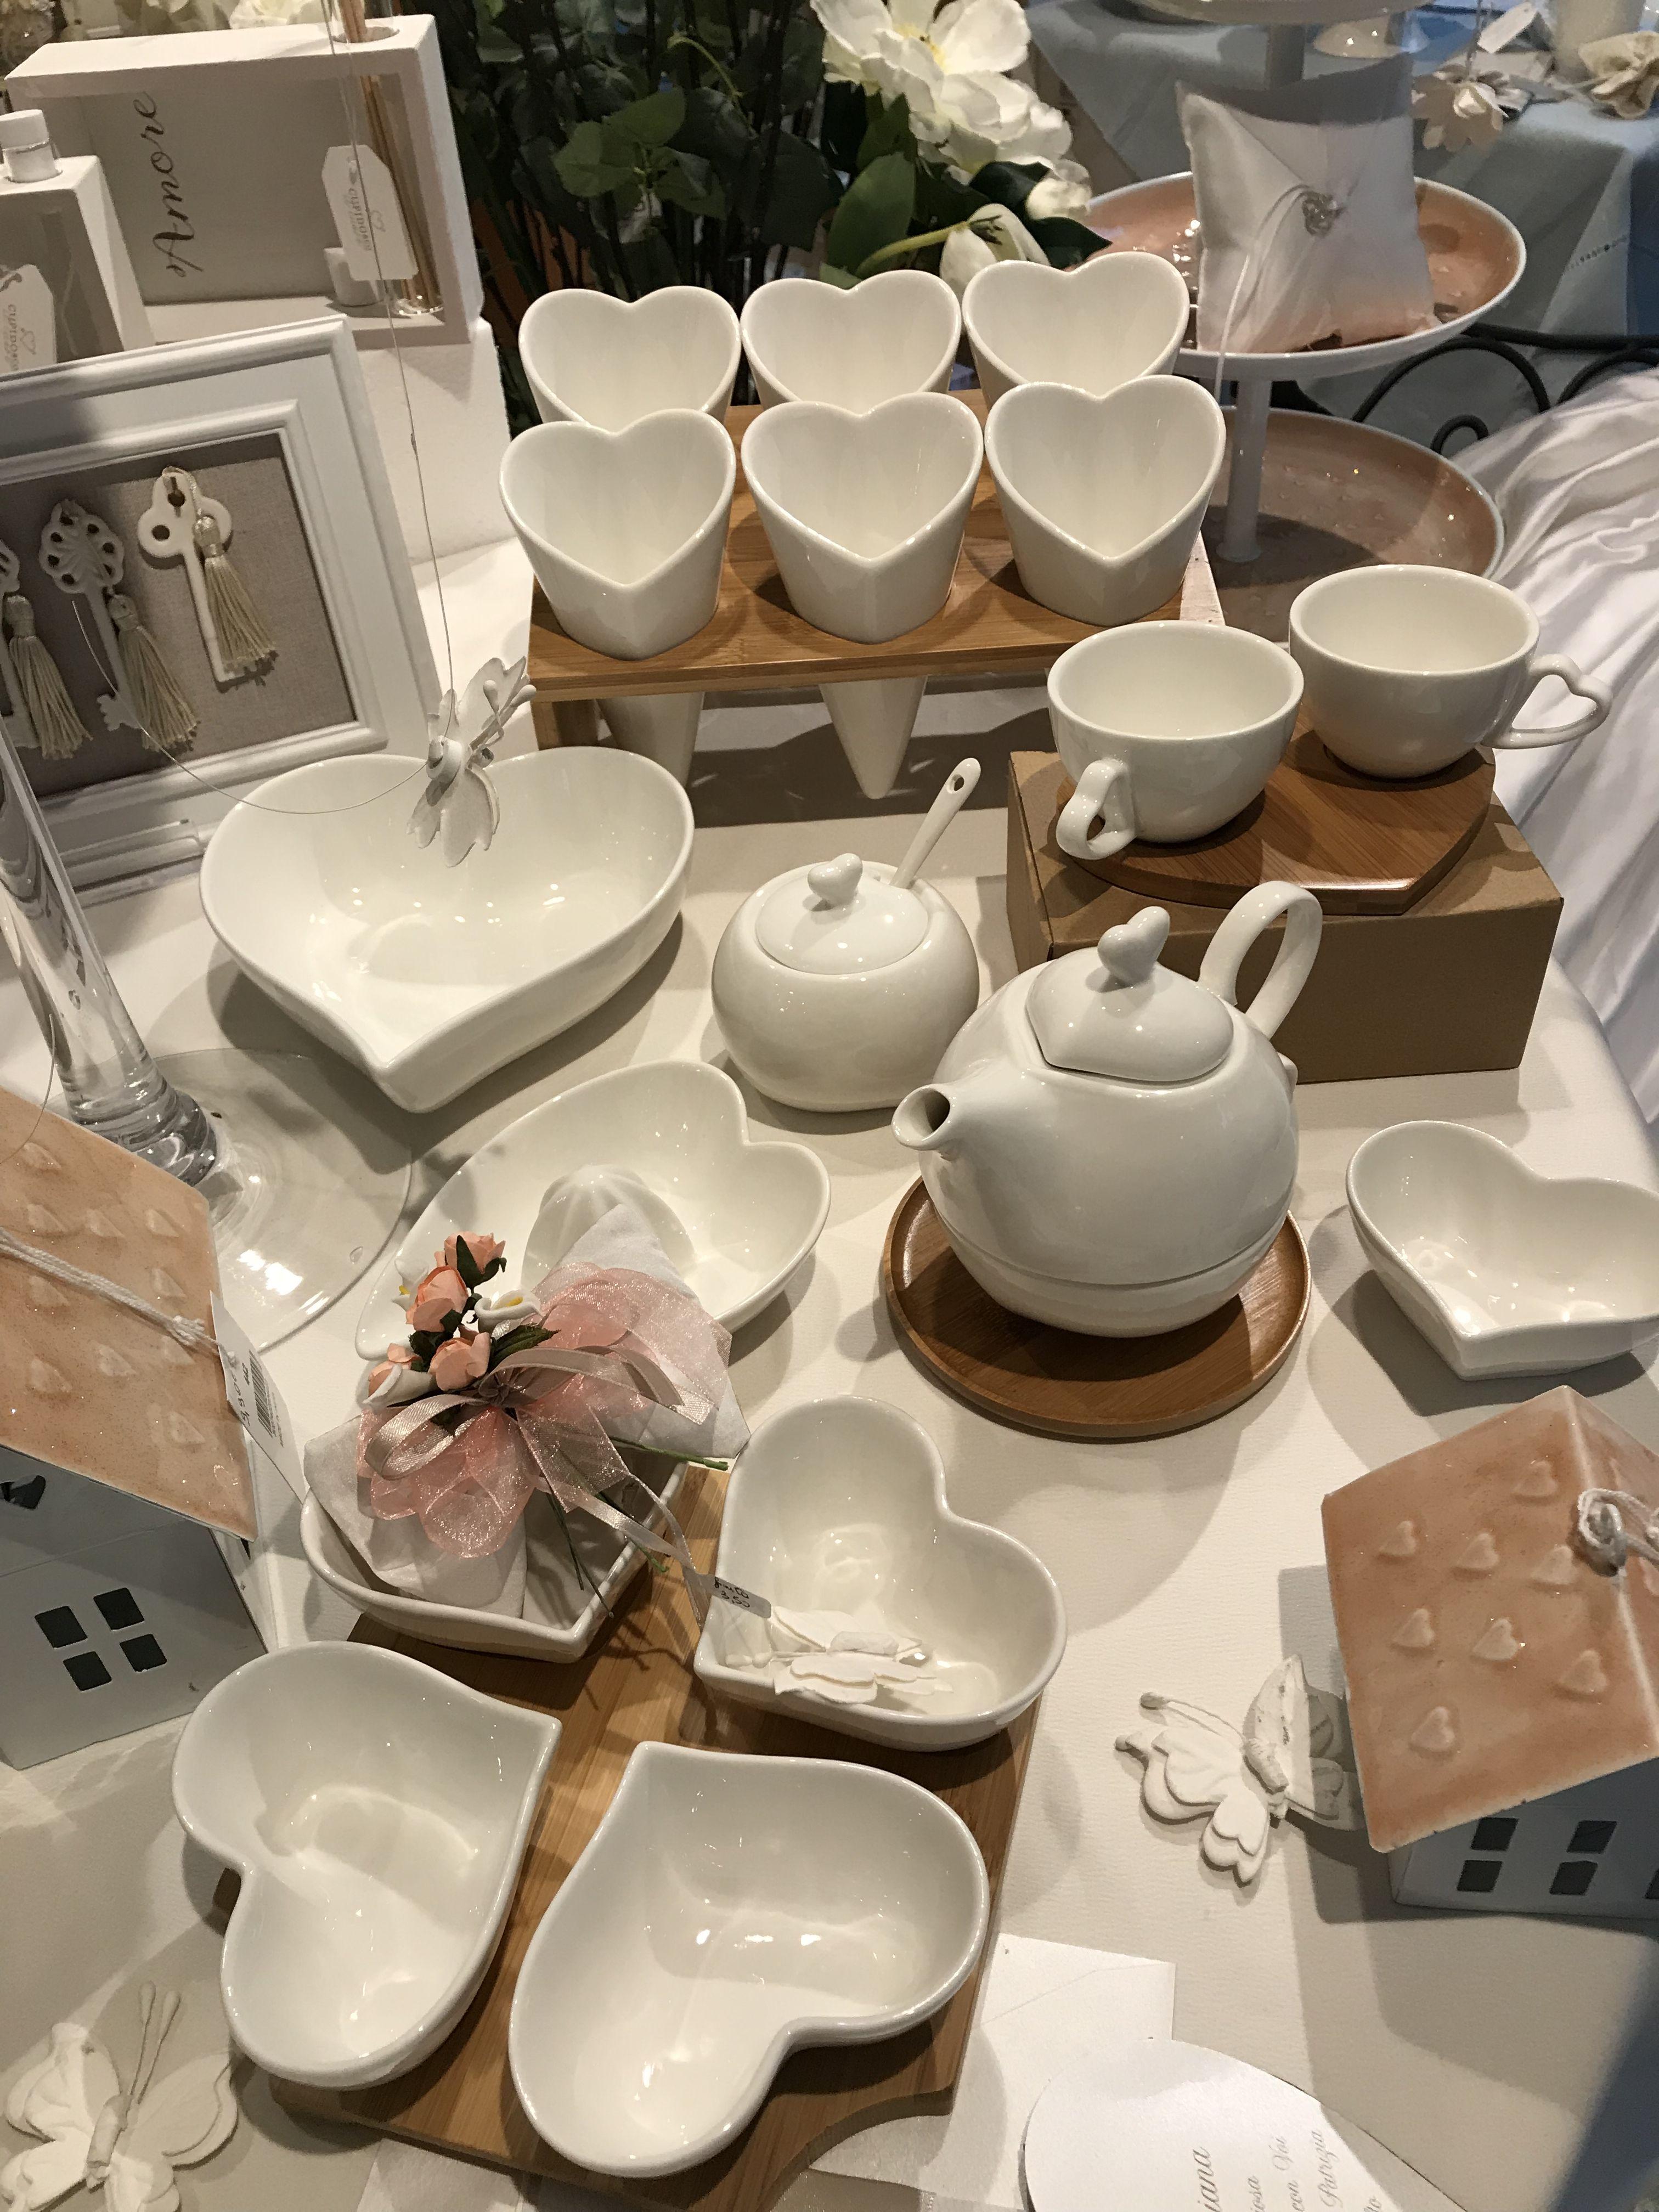 Bomboniere Utili Per Un Matrimonio Elegante Www Elisa Regali It Table Settings Table